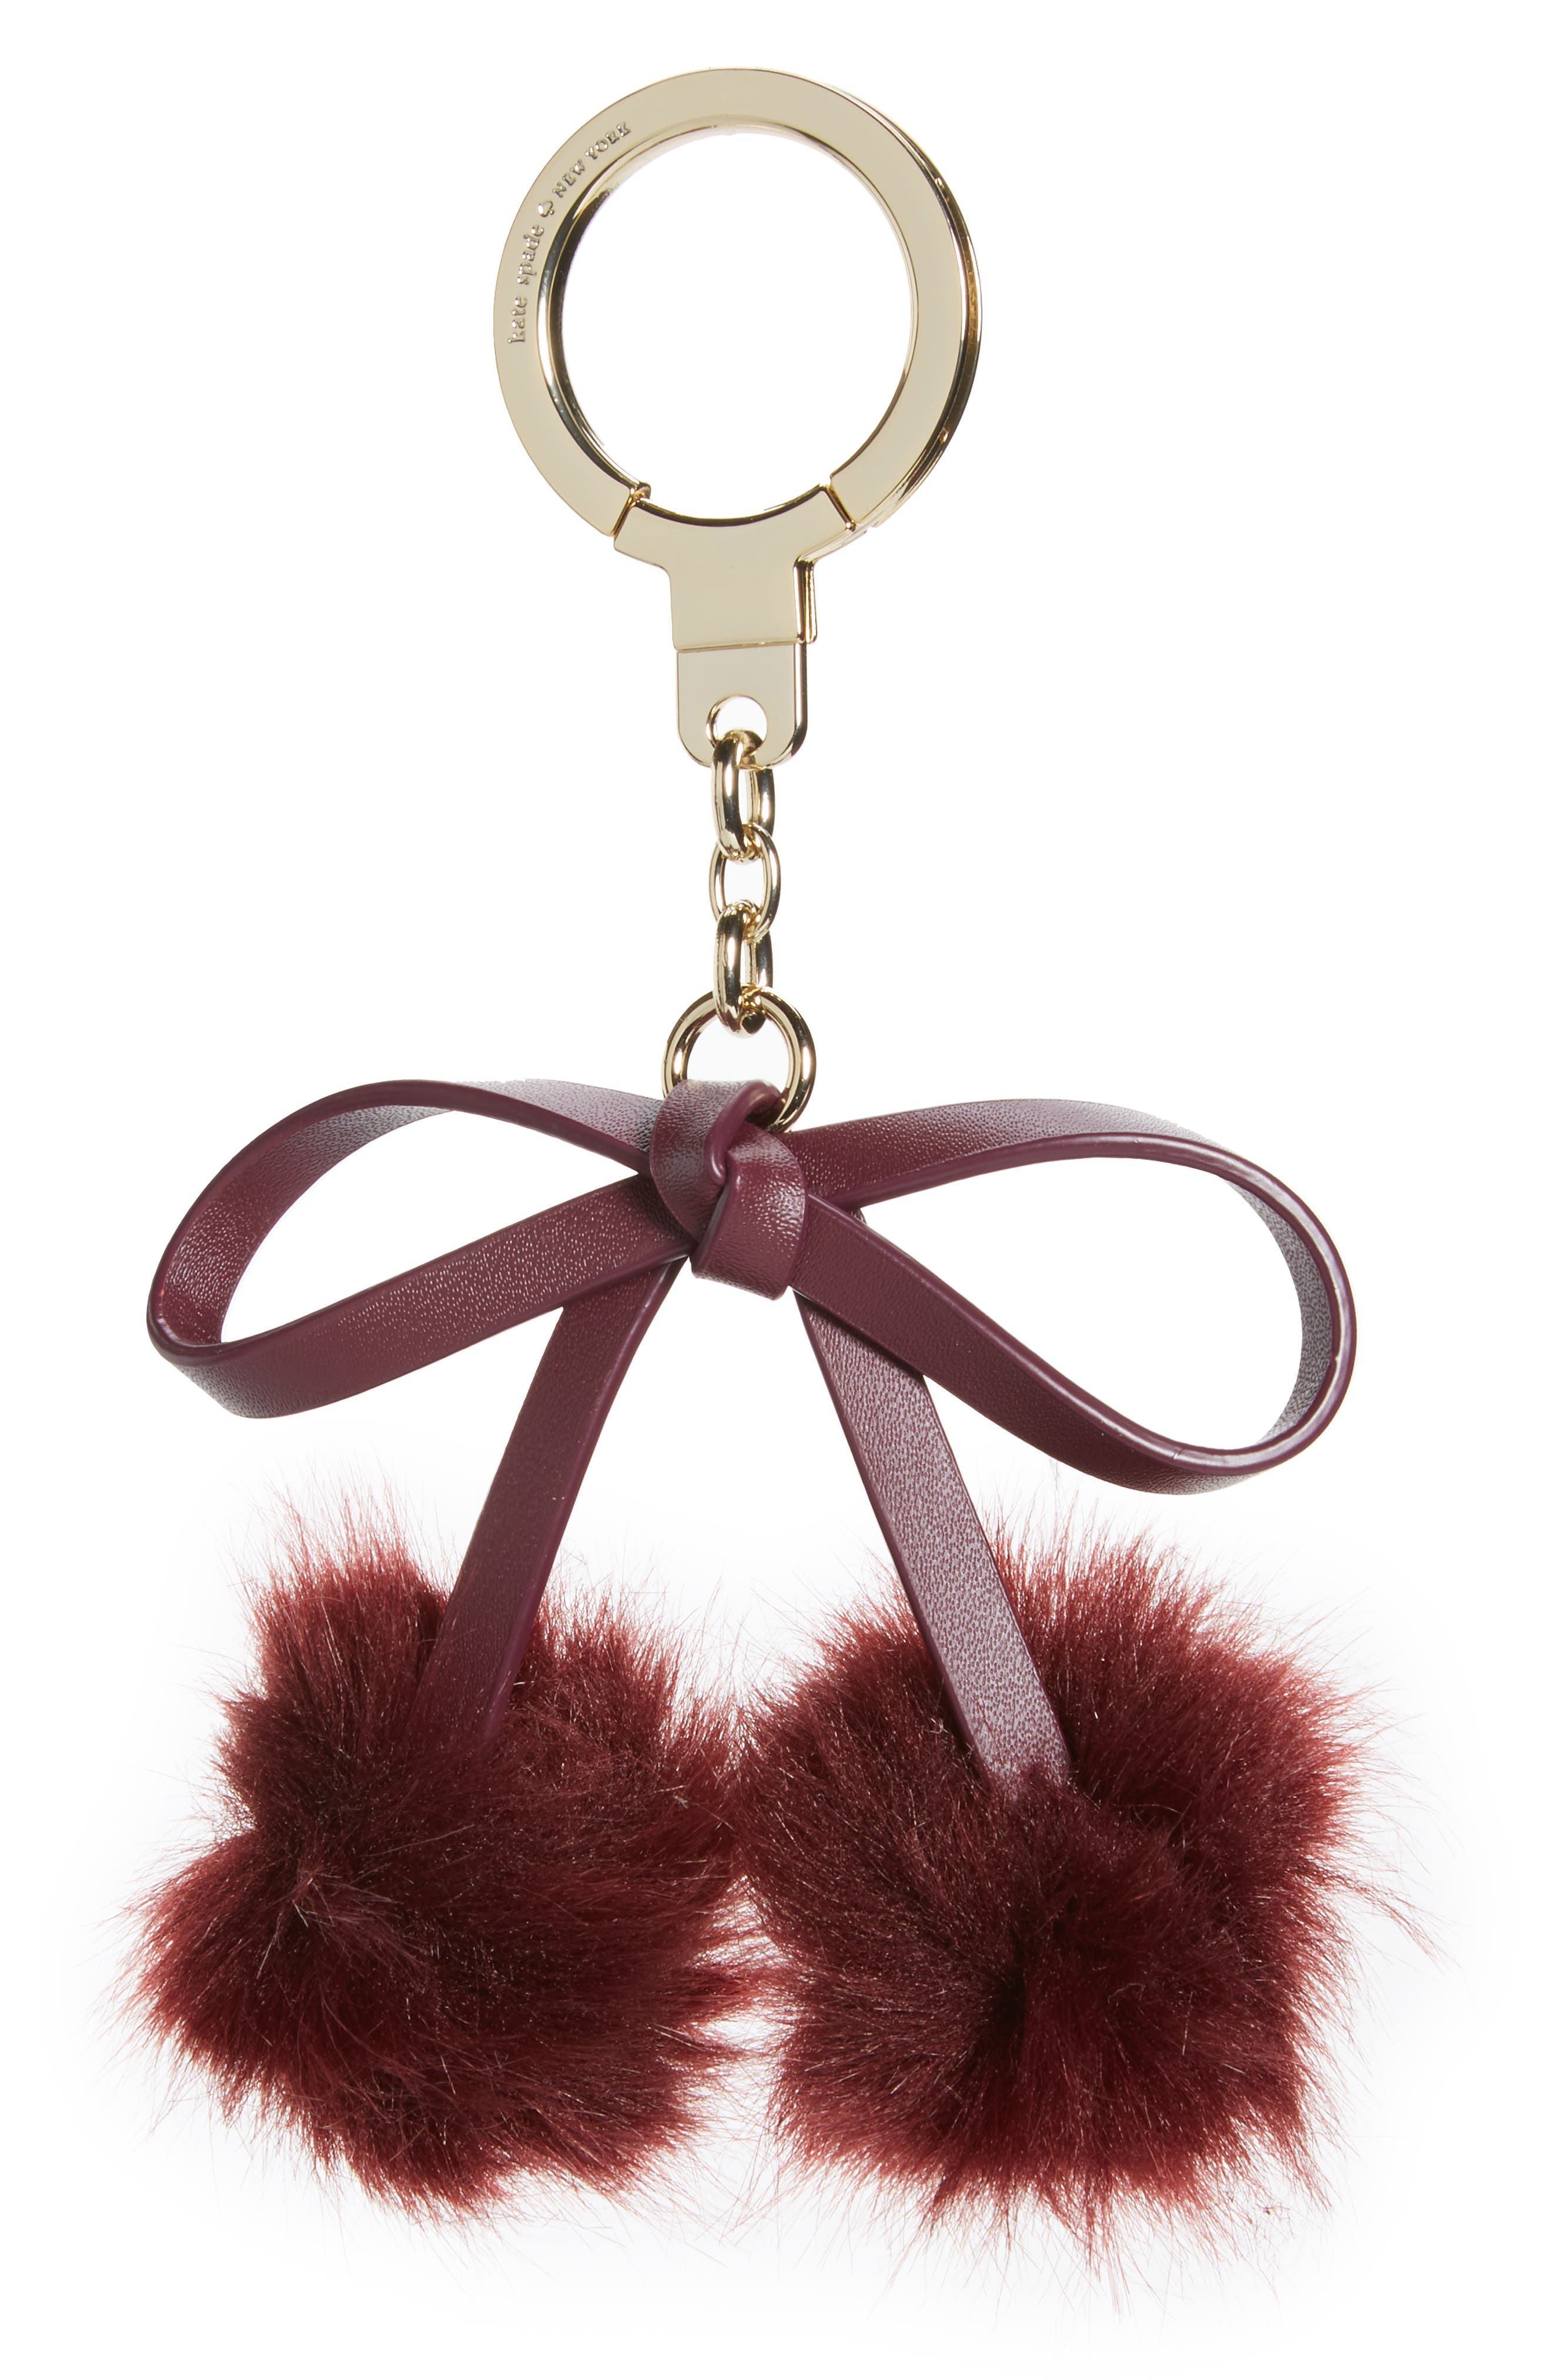 kate spade new york faux fur bow pom bag charm